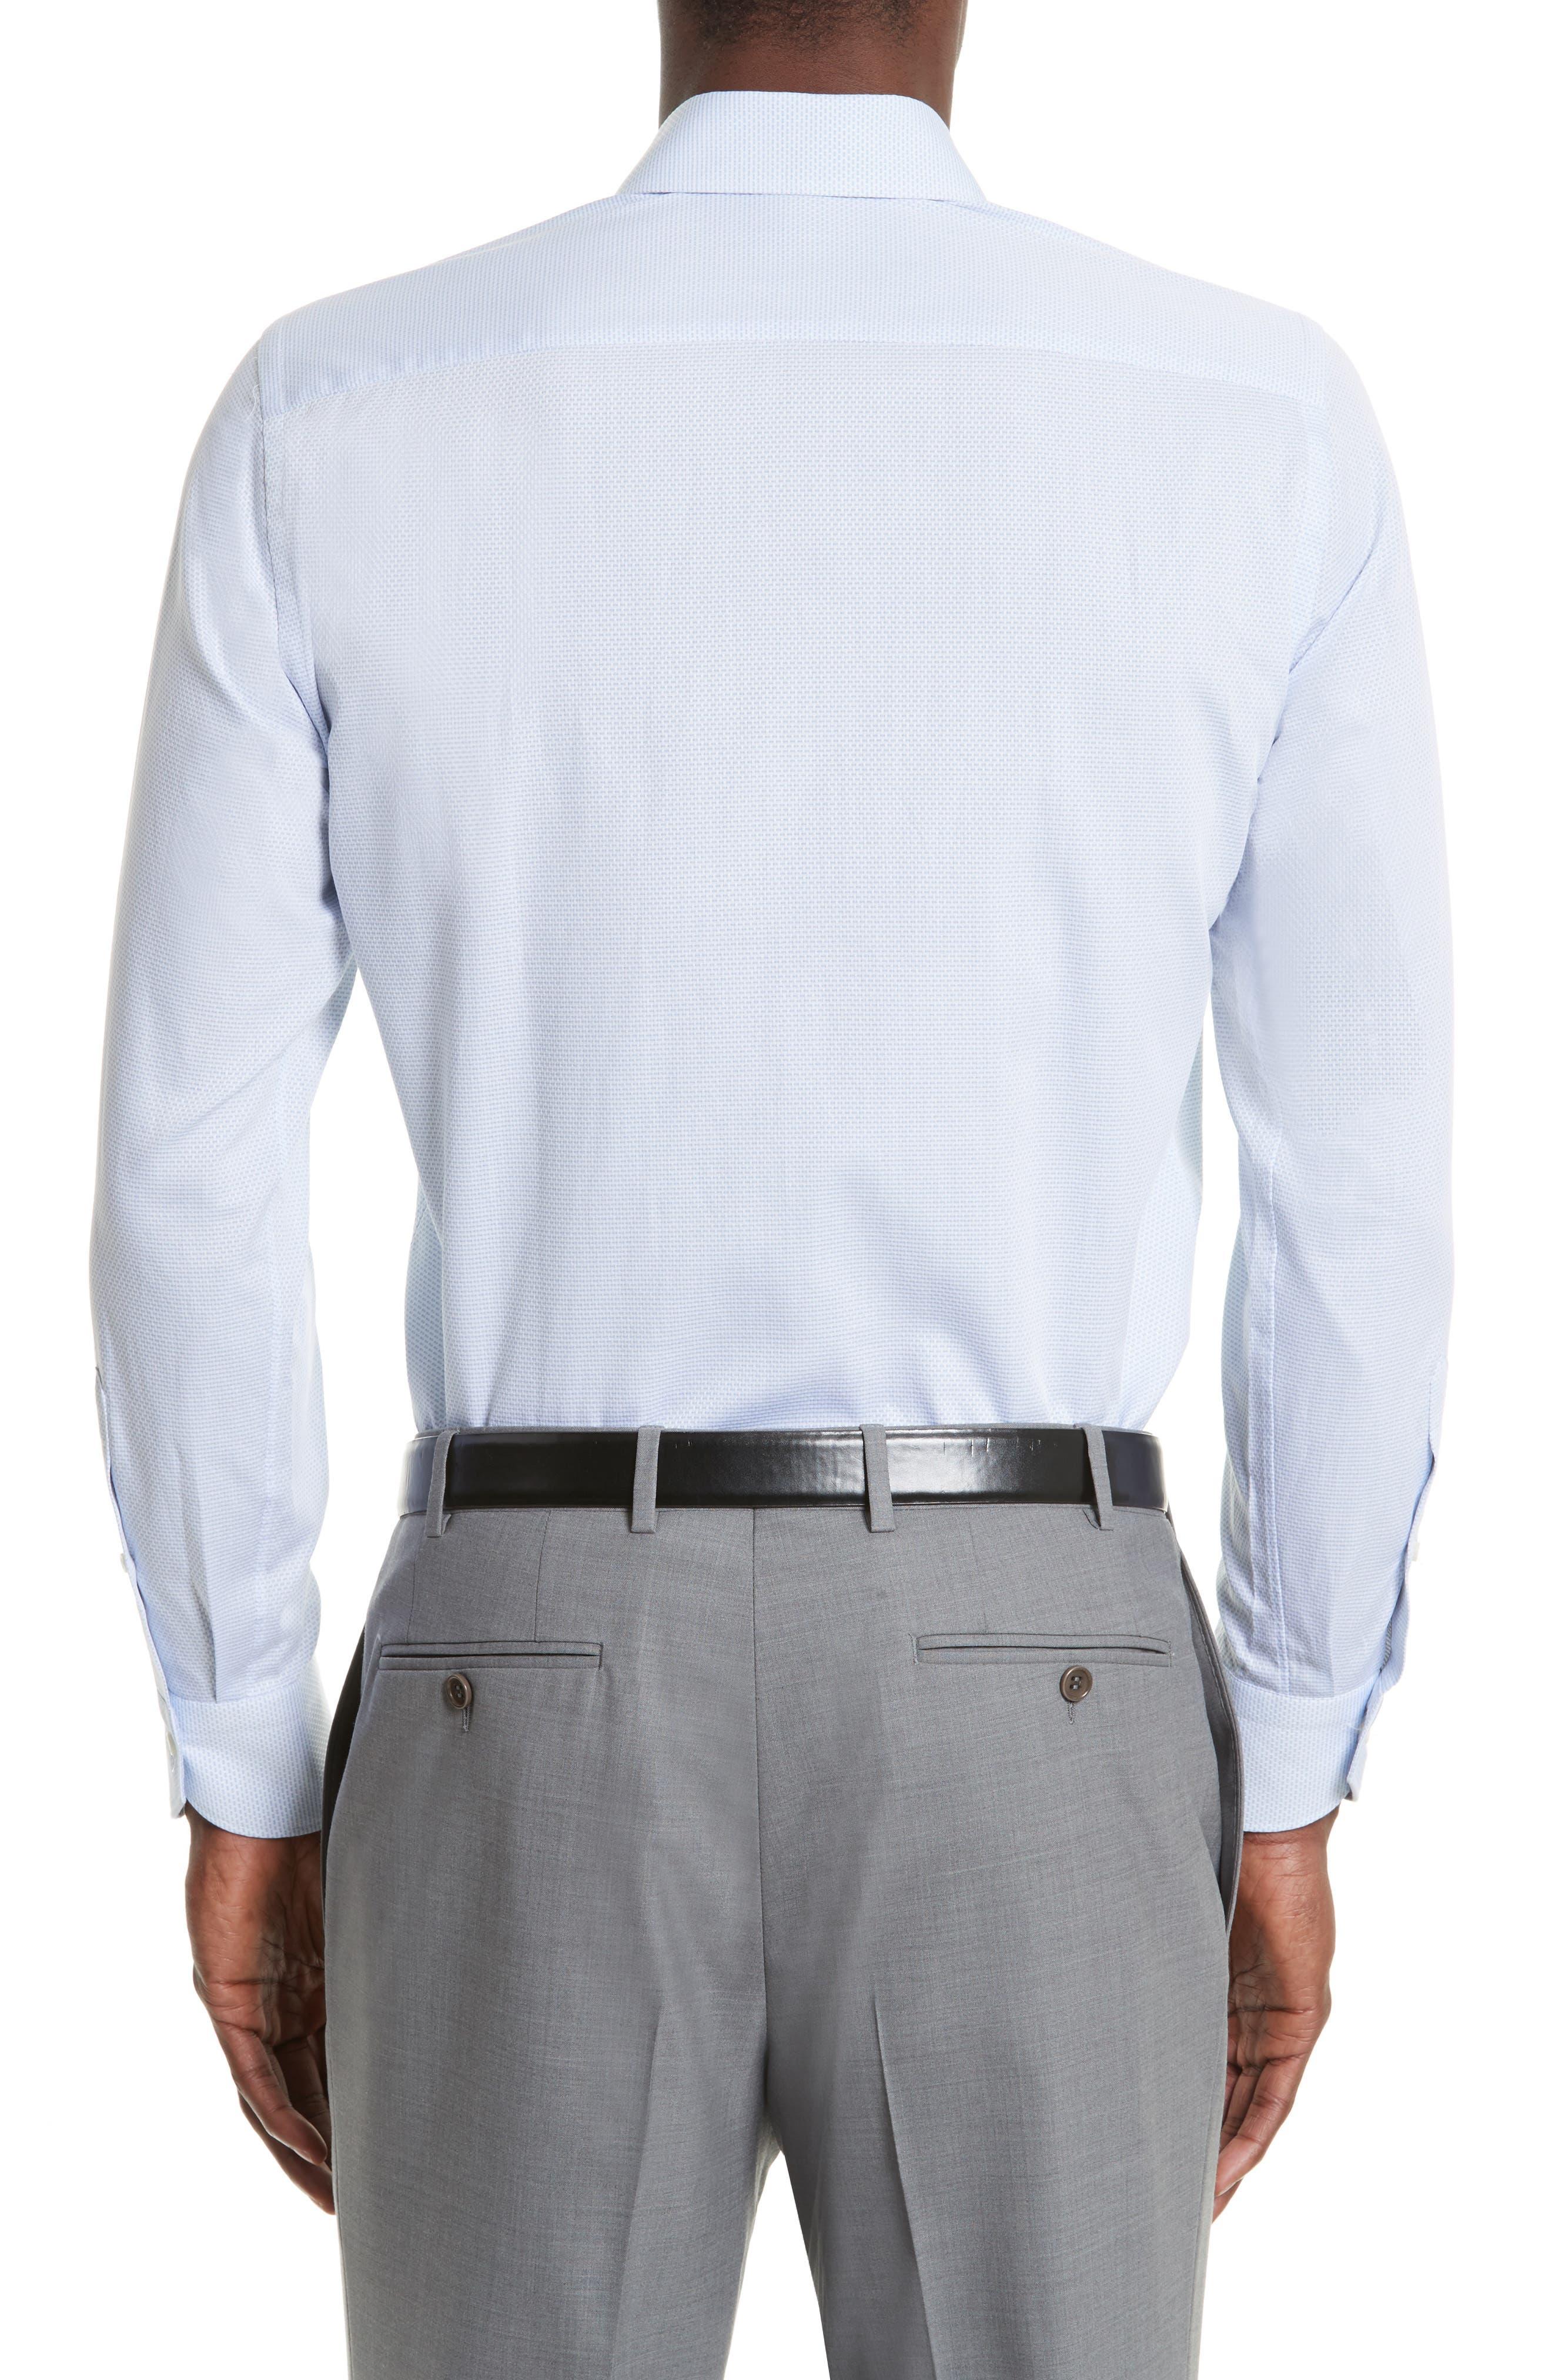 Regular Fit Solid Dress Shirt,                             Alternate thumbnail 3, color,                             Light Blue